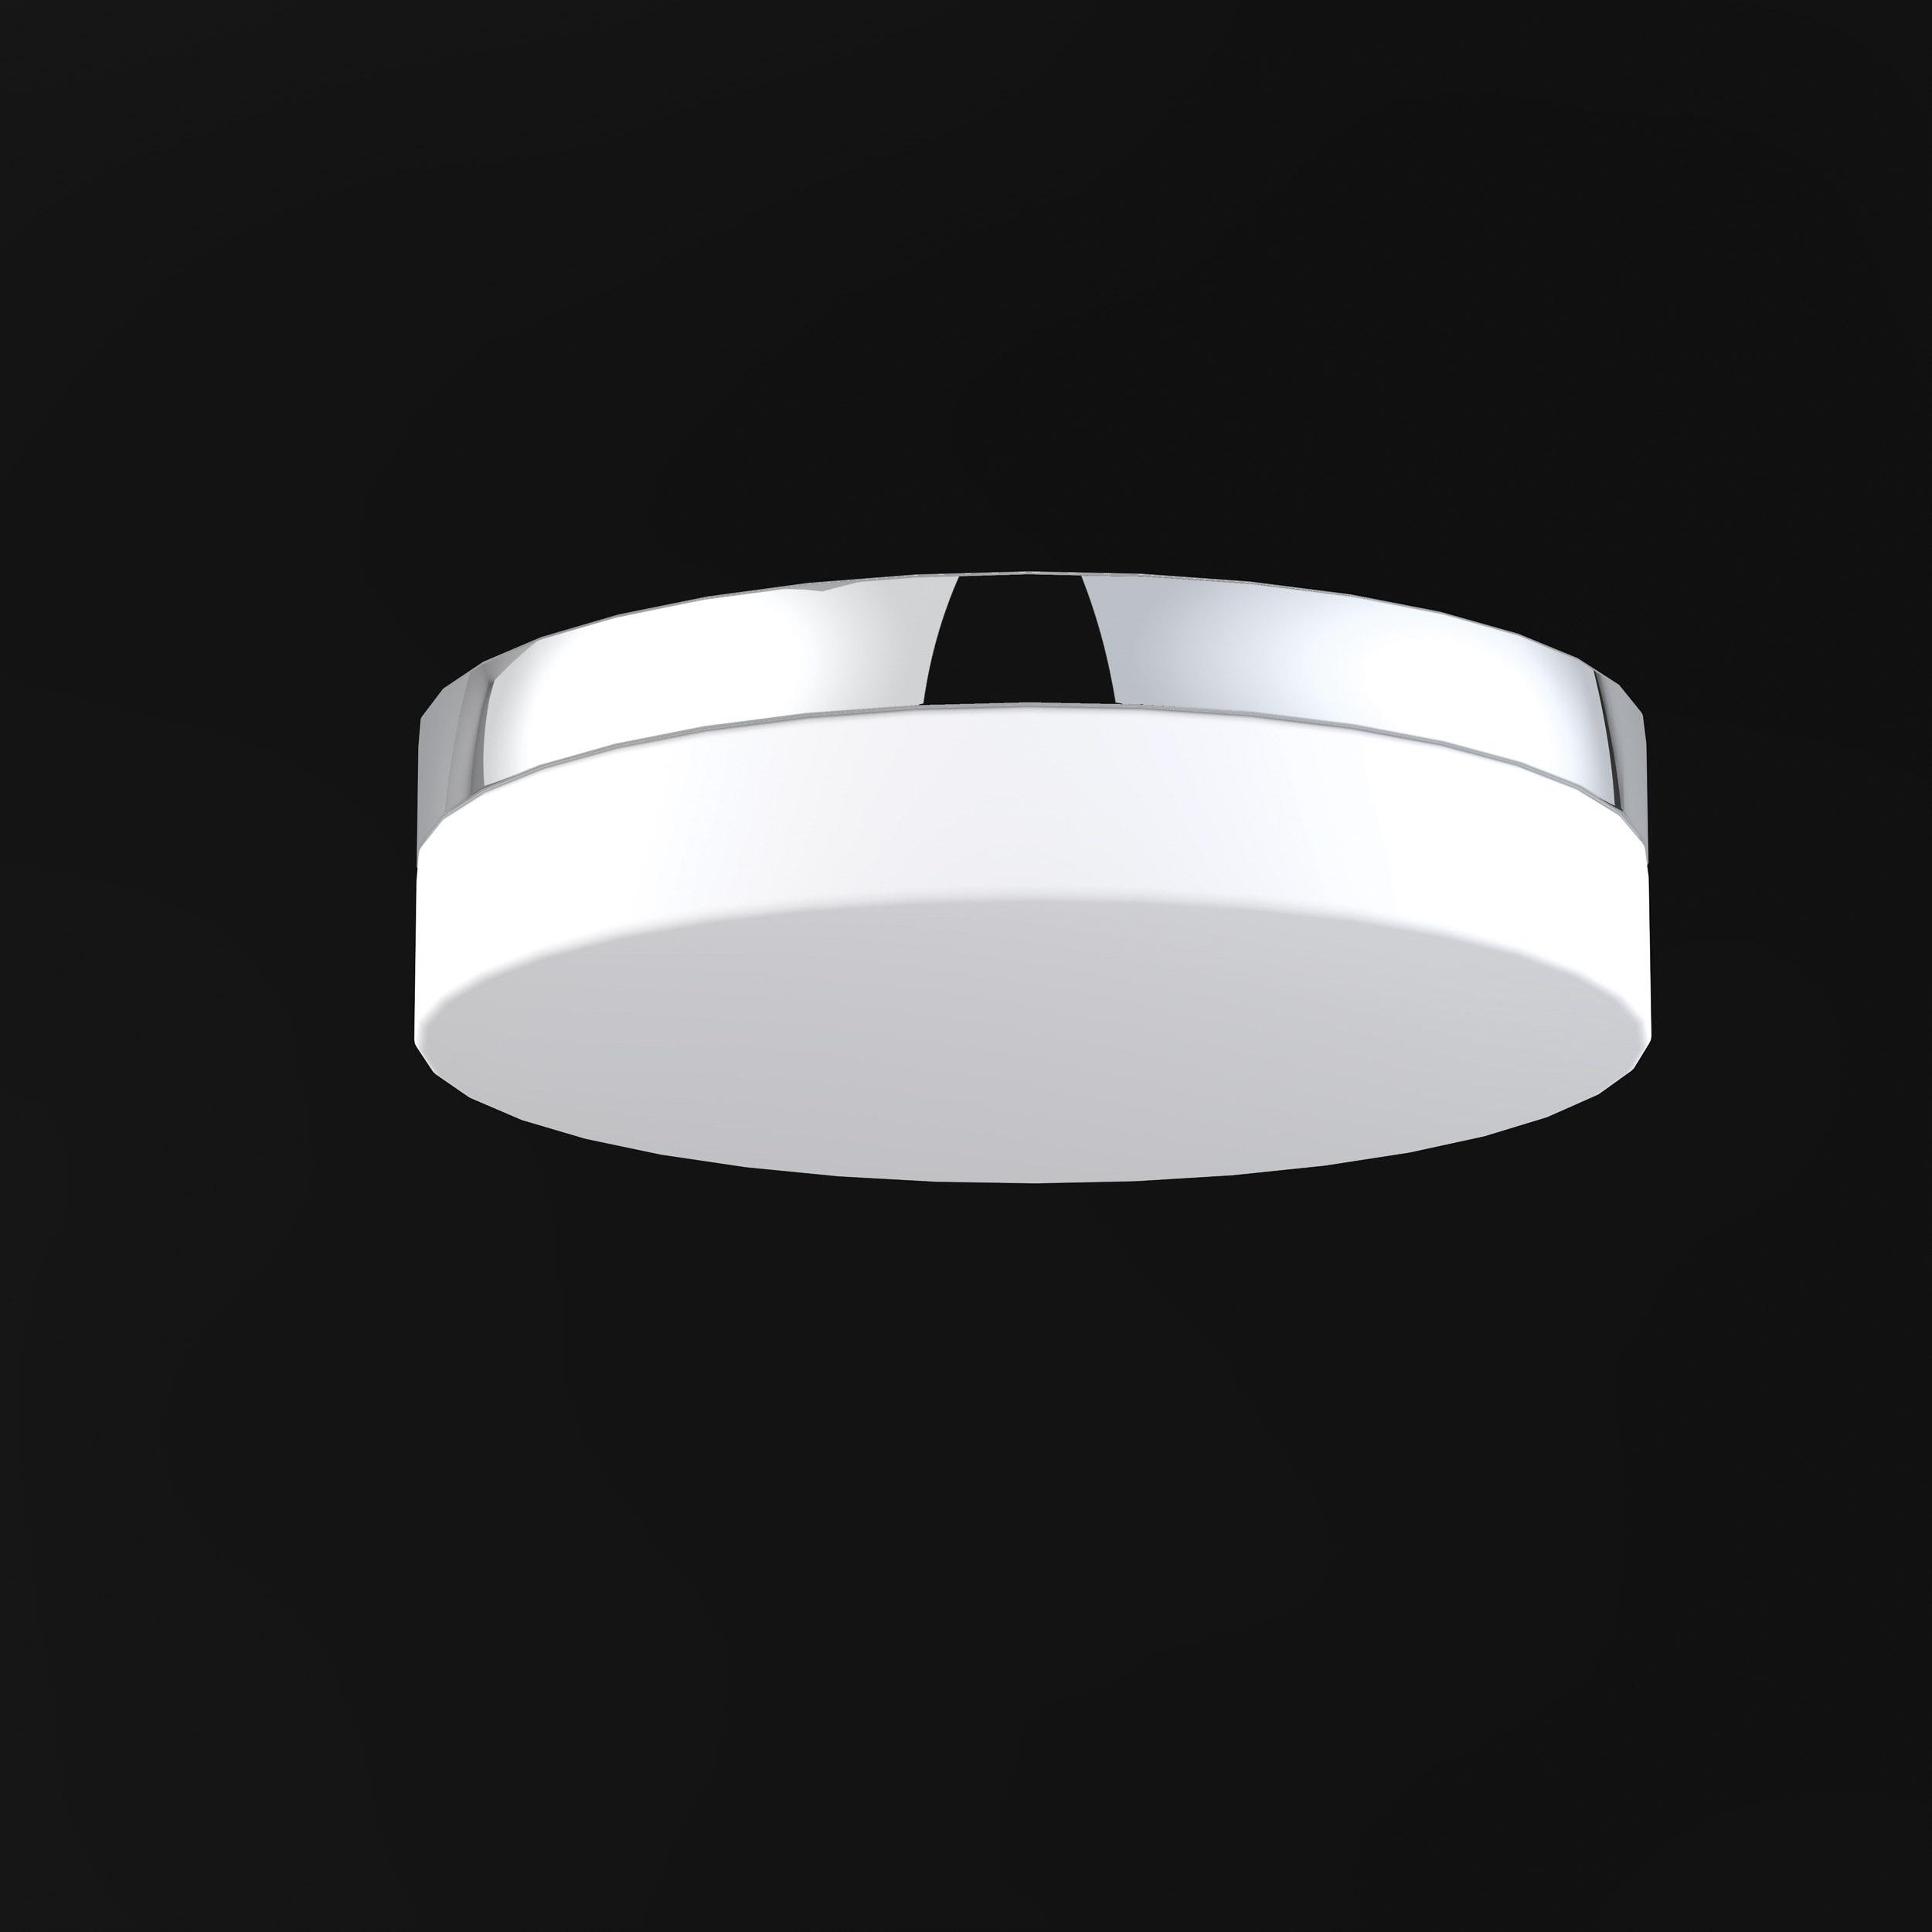 Drum Style Led Bathroom Ceiling Light Leyton Lighting